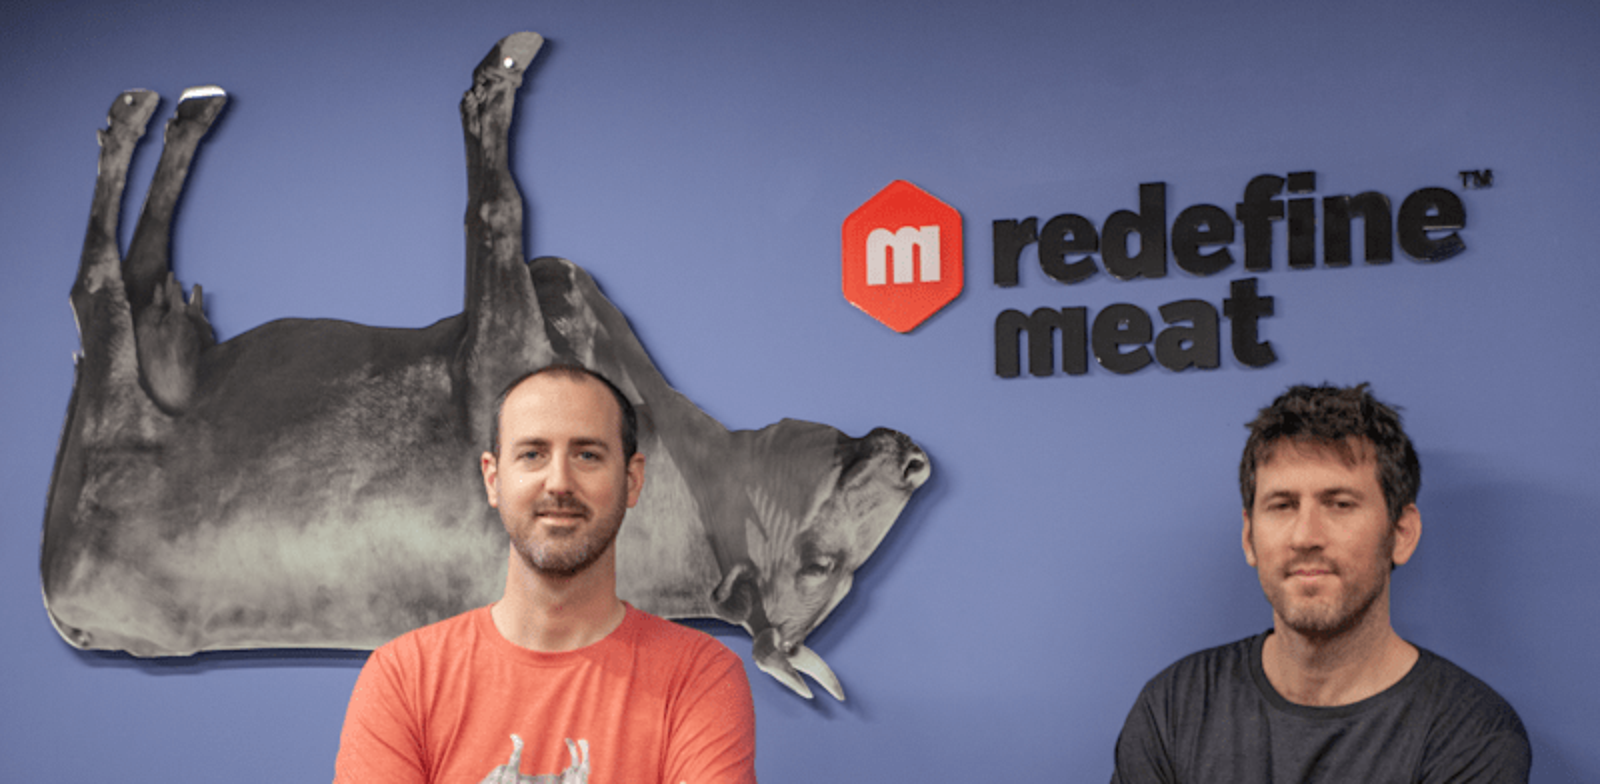 Redefine Meat founders Eshchar Ben-Shitrit and Adam Lahav